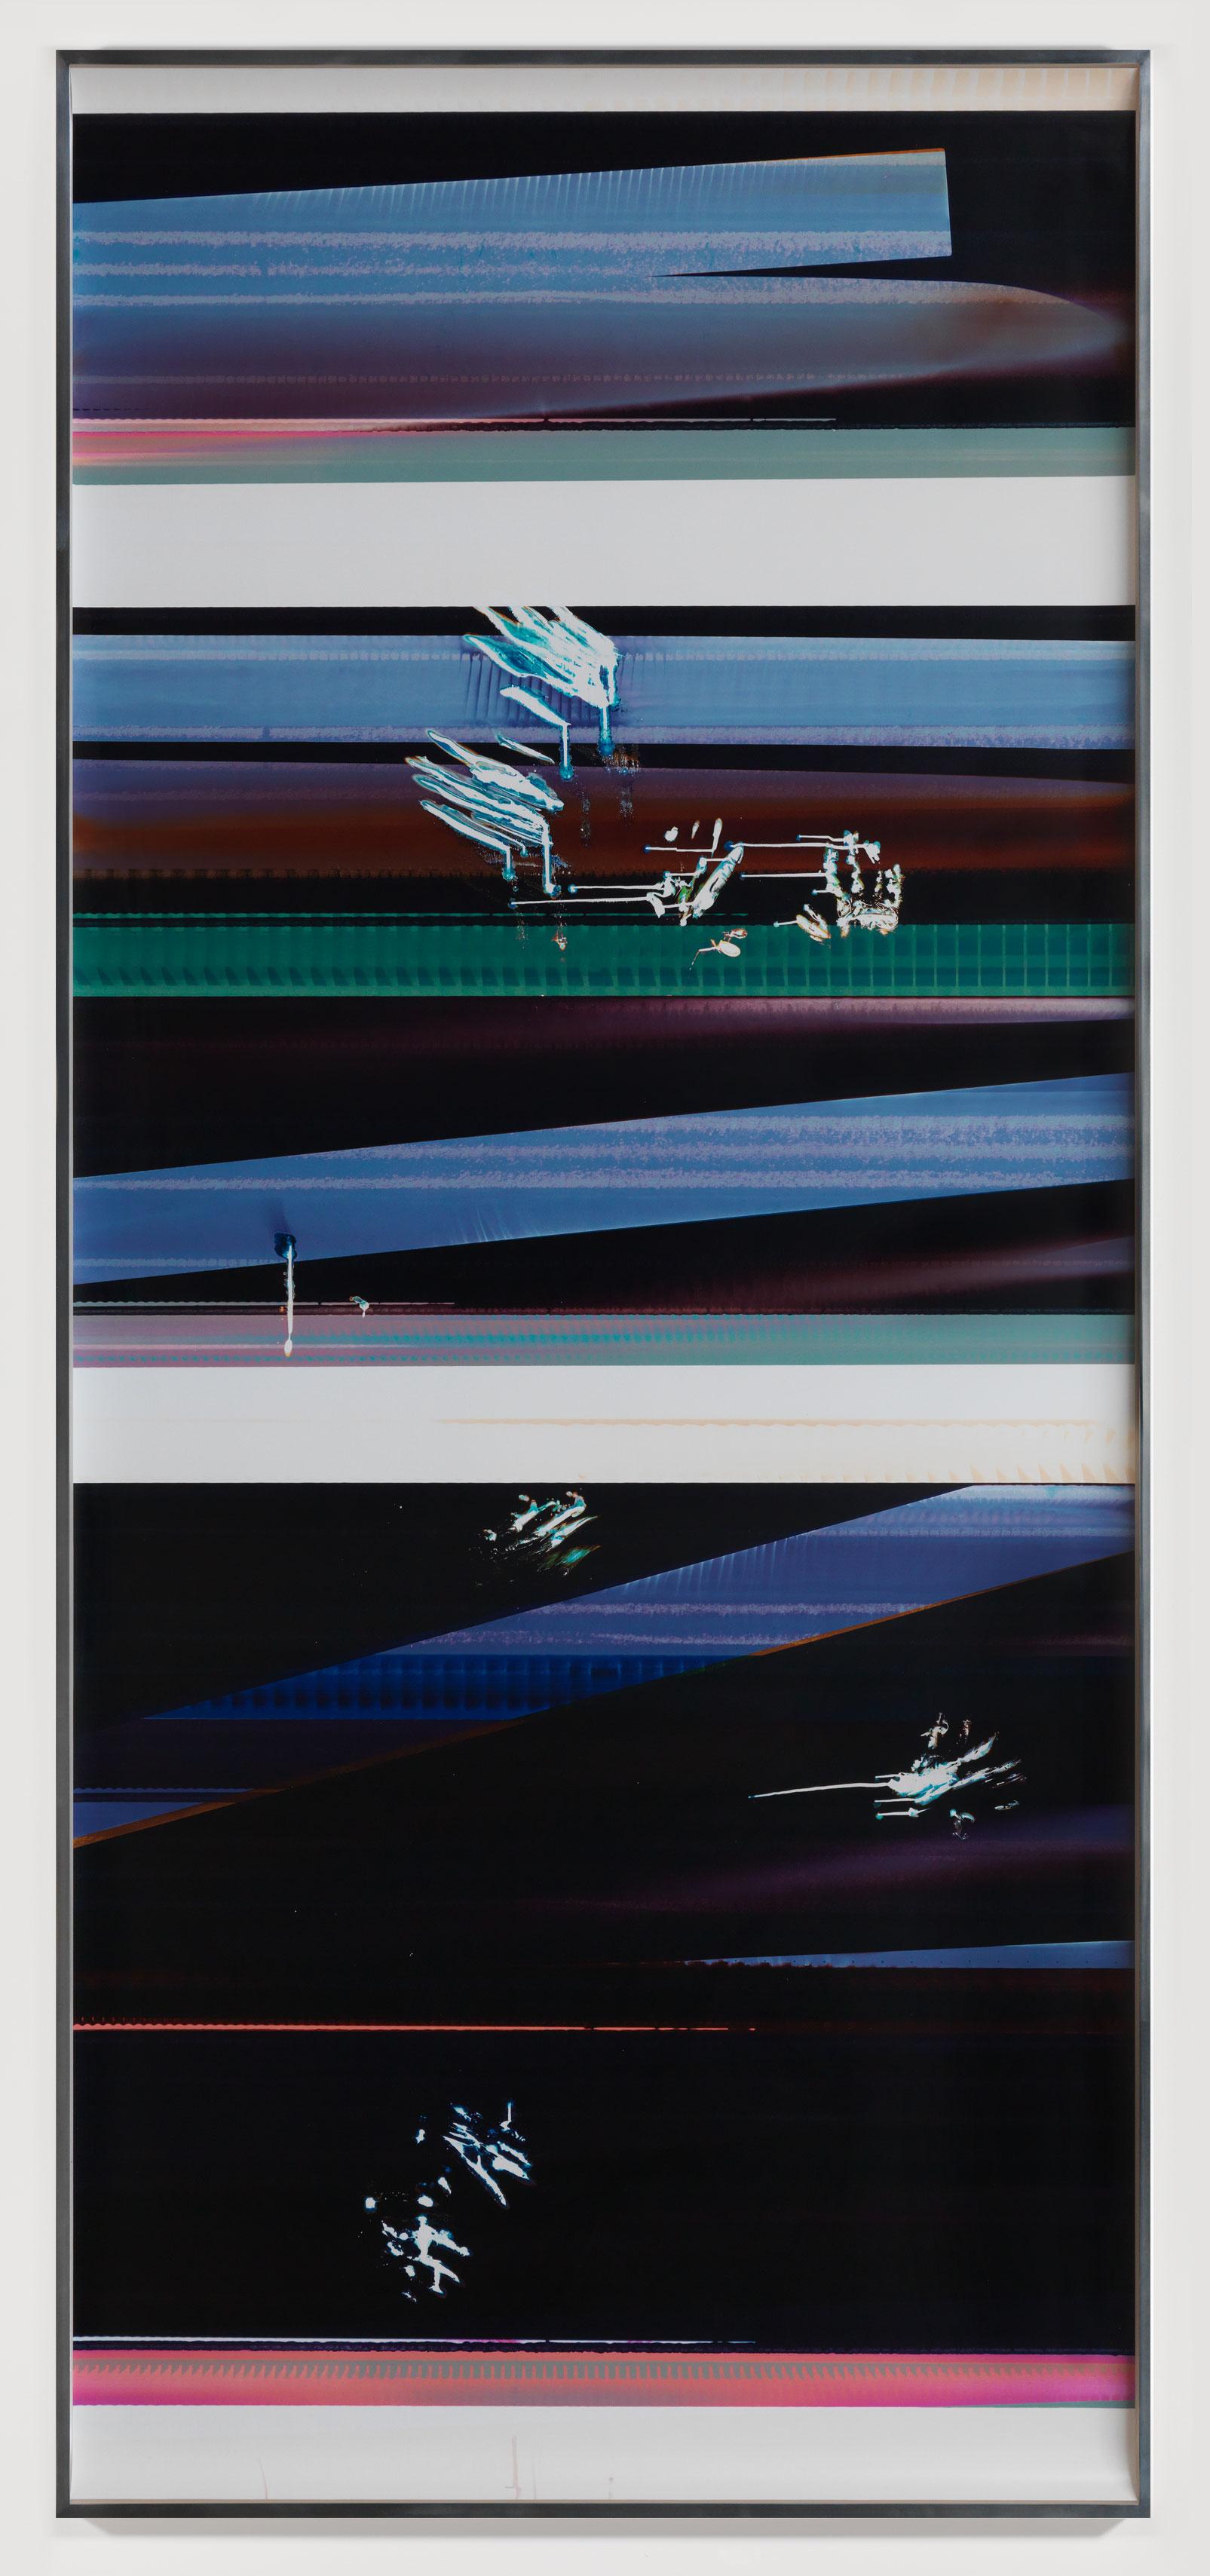 Cross-Contaminated RA4 Contact Print [Black Curl (9:6/YMC/Six Magnet: Los Angeles, California, August 13, 2014, Fujicolor Crystal Archive Super Type C, Em. No. 112-012, Kodak Ektacolor RA Bleach-Fix and Replenisher, Cat. No. 847 1484, 81414), Kreonite KM IV 5225 RA4 Color Processor, Ser. No. 00092174]   2014  Color photographic paper  116 1/4 x 50 inches   RA4 Contact Print Curls, 2014–    Gastarbeiten, 2014